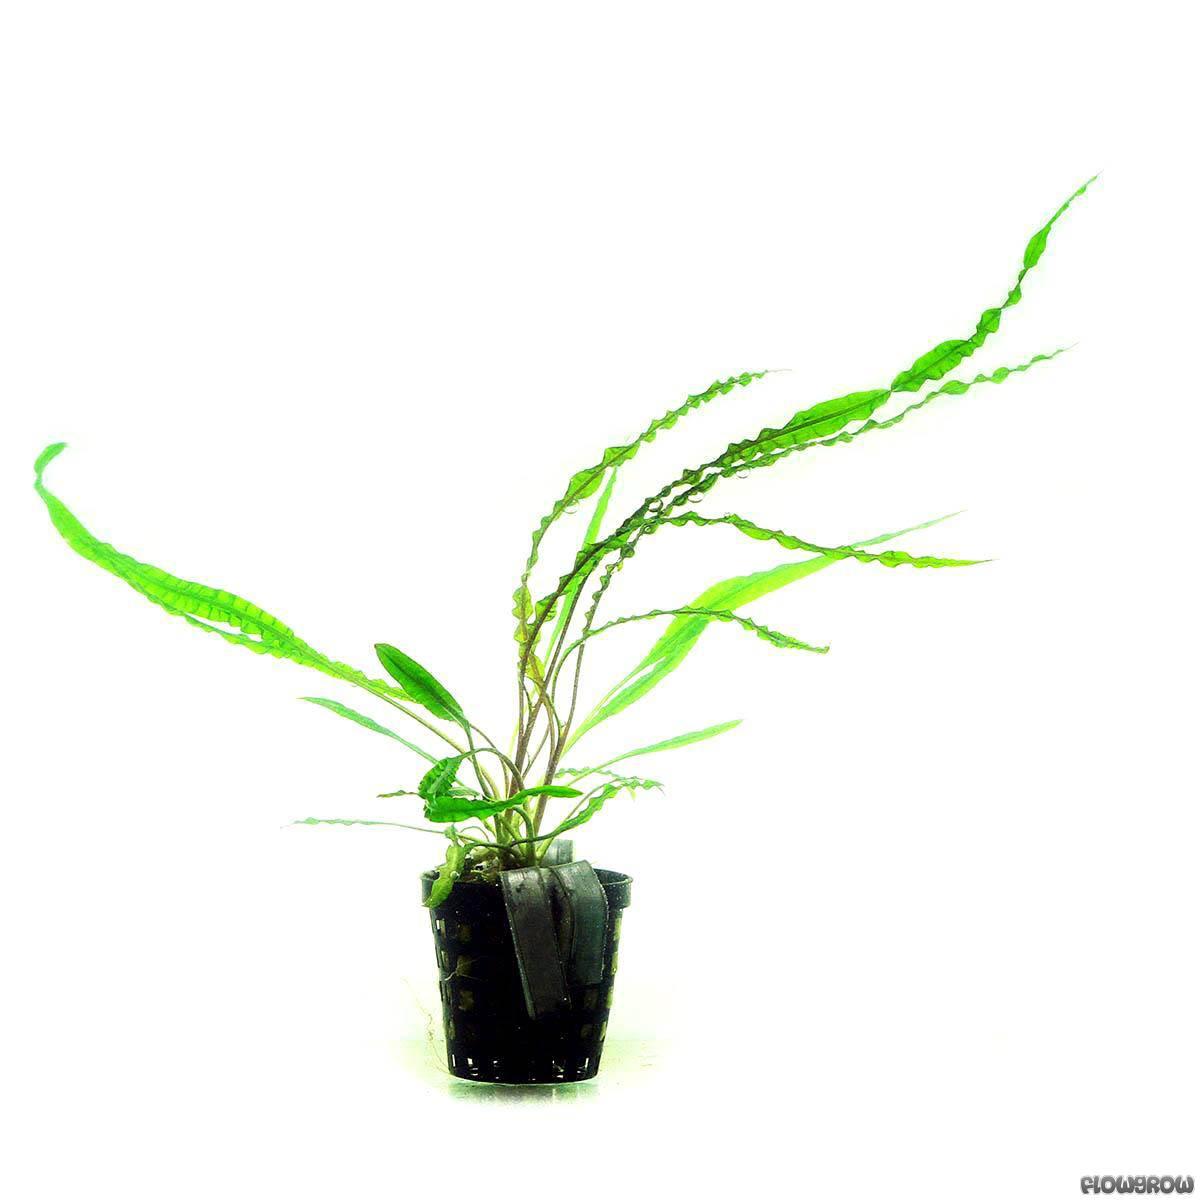 Cryptocoryne Crispatula Var Balansae Flowgrow Aquatic Plant Database